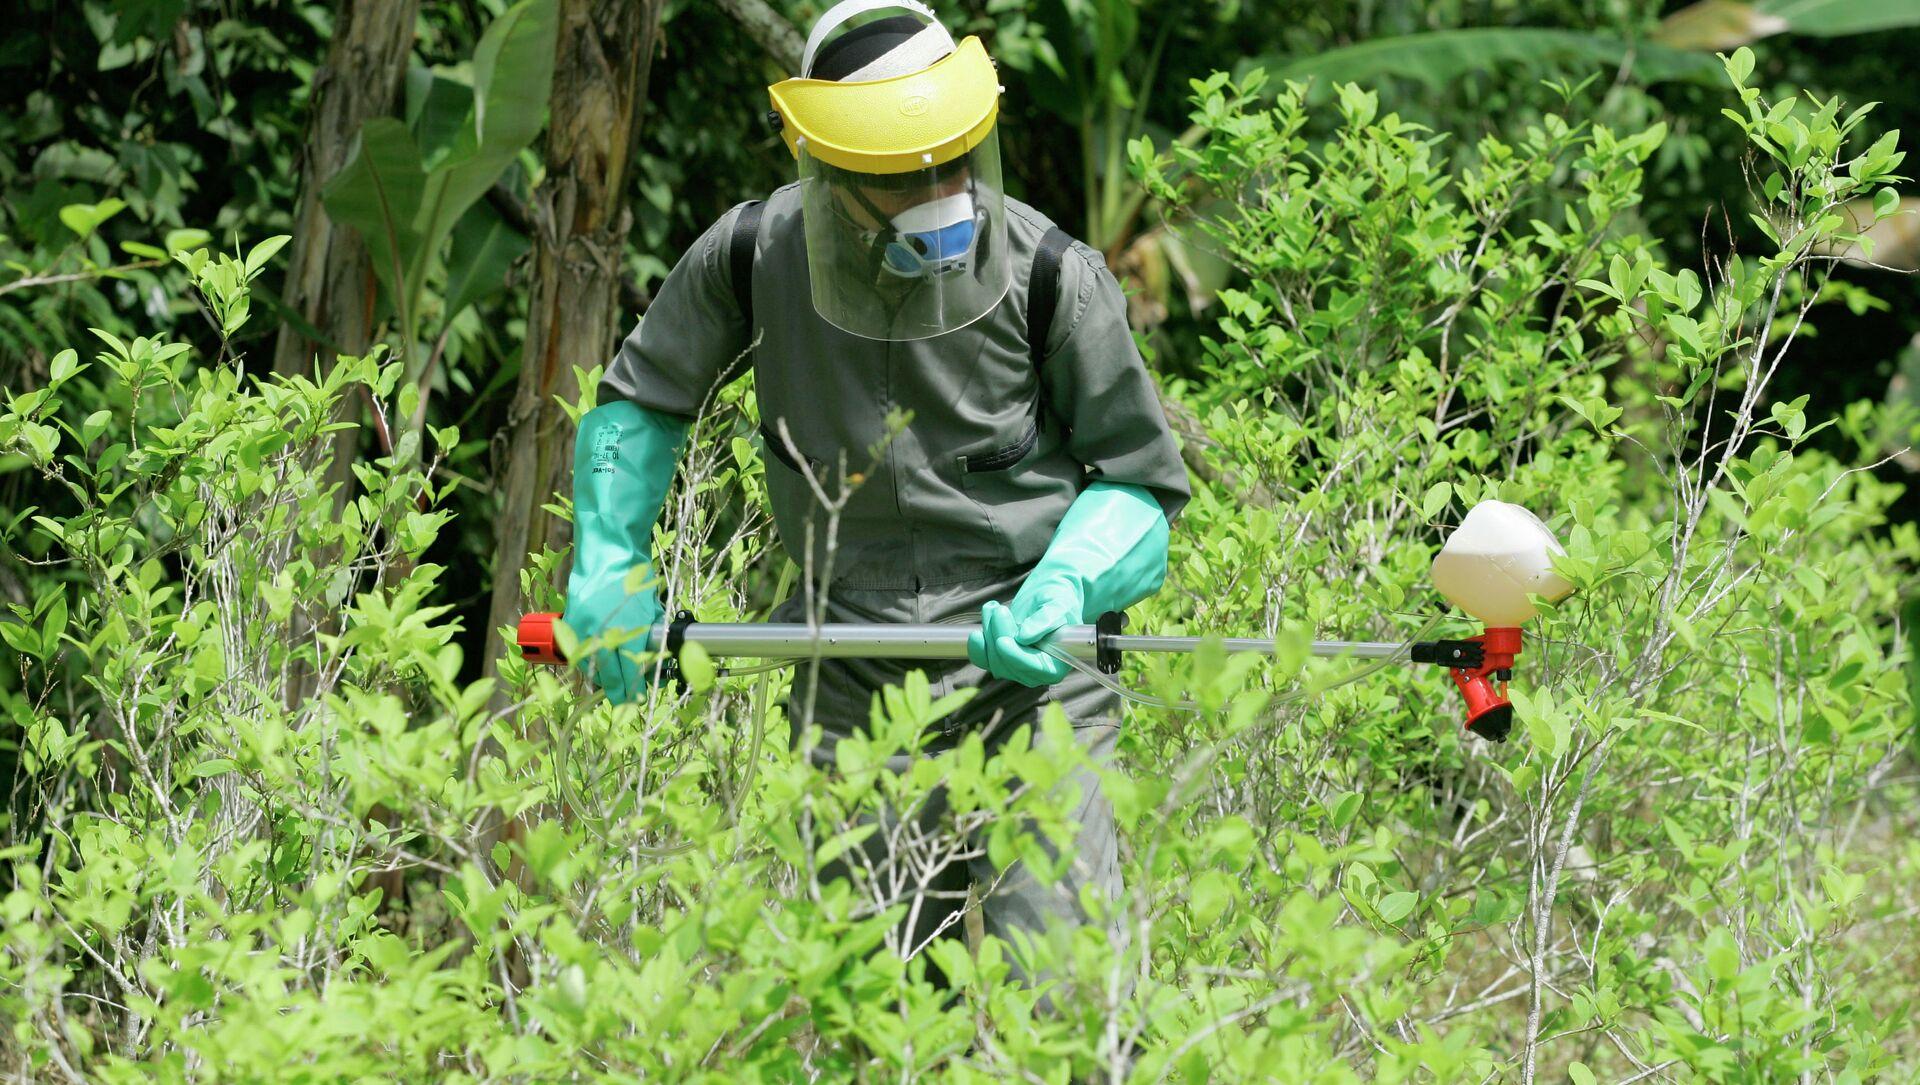 A counter-narcotics police officer sprays herbicide over a coca plant during a campaign to eradicate coca crops in La Espriella, southern Colombia. - Sputnik Mundo, 1920, 16.09.2020